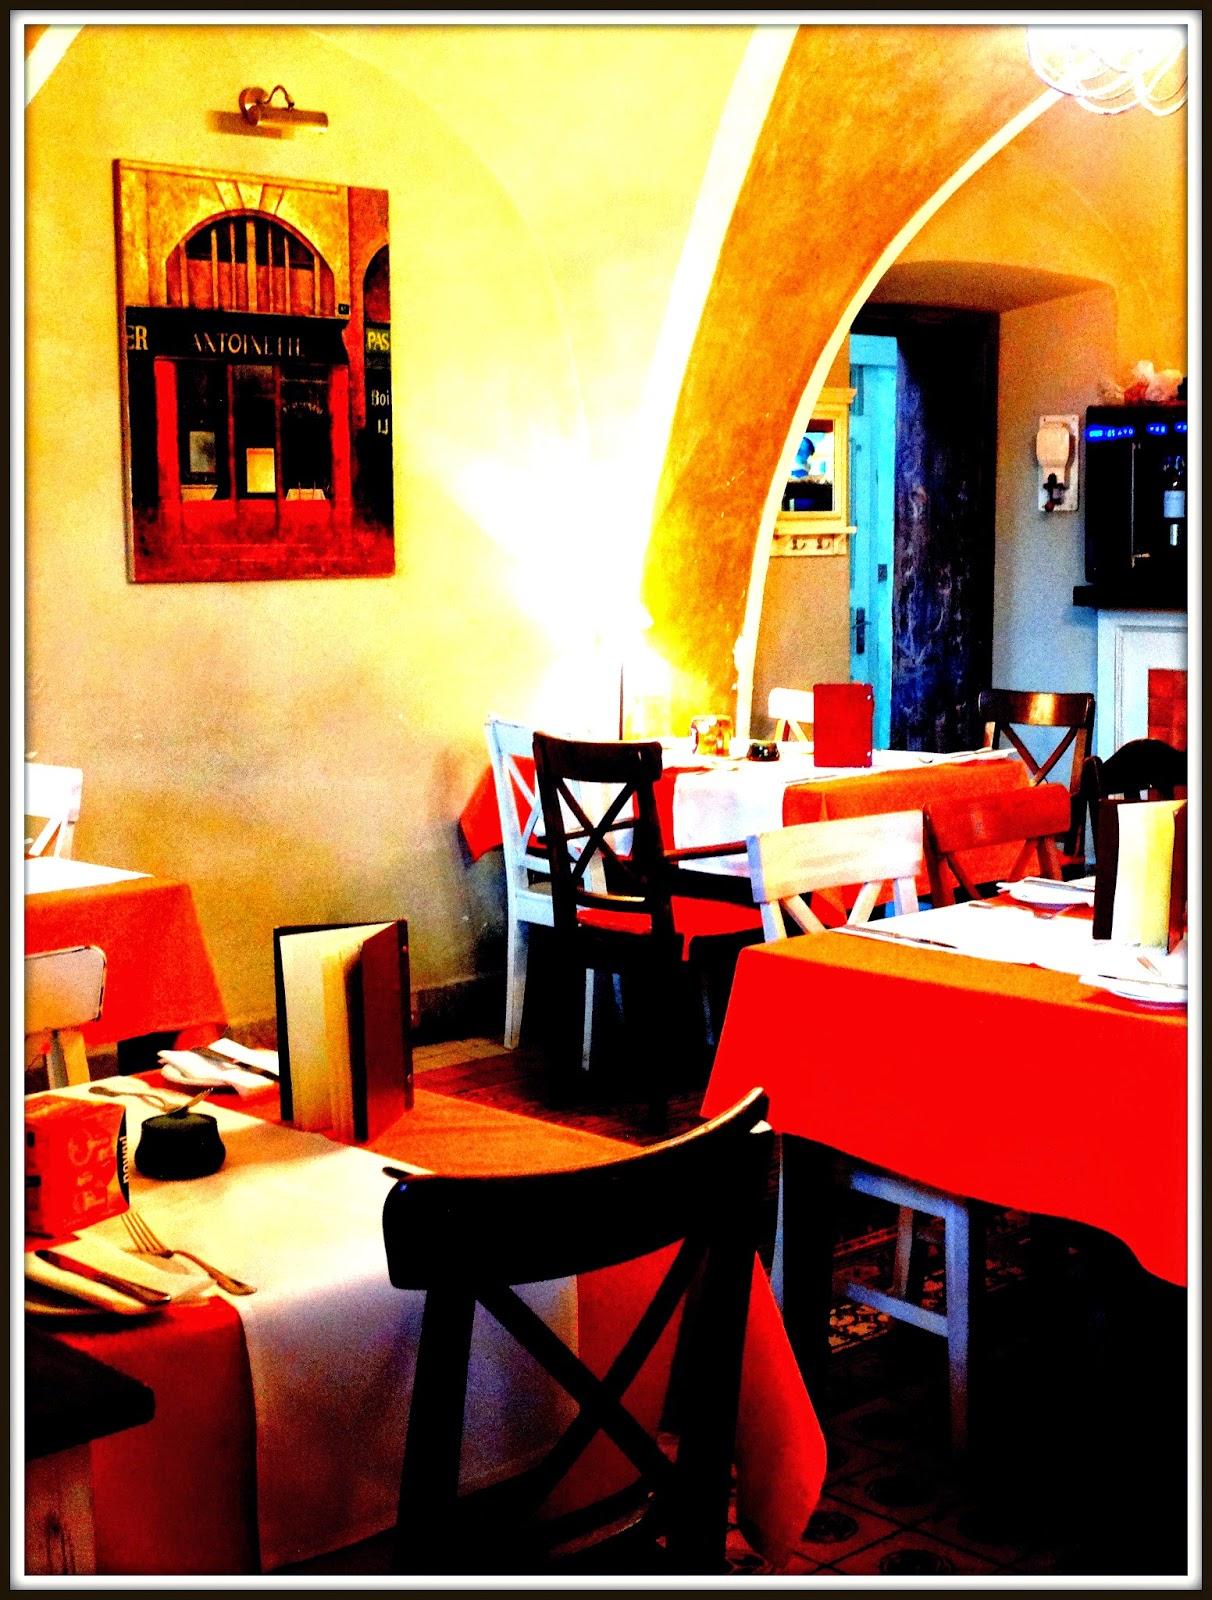 Restauracja Aperitif, Kraków